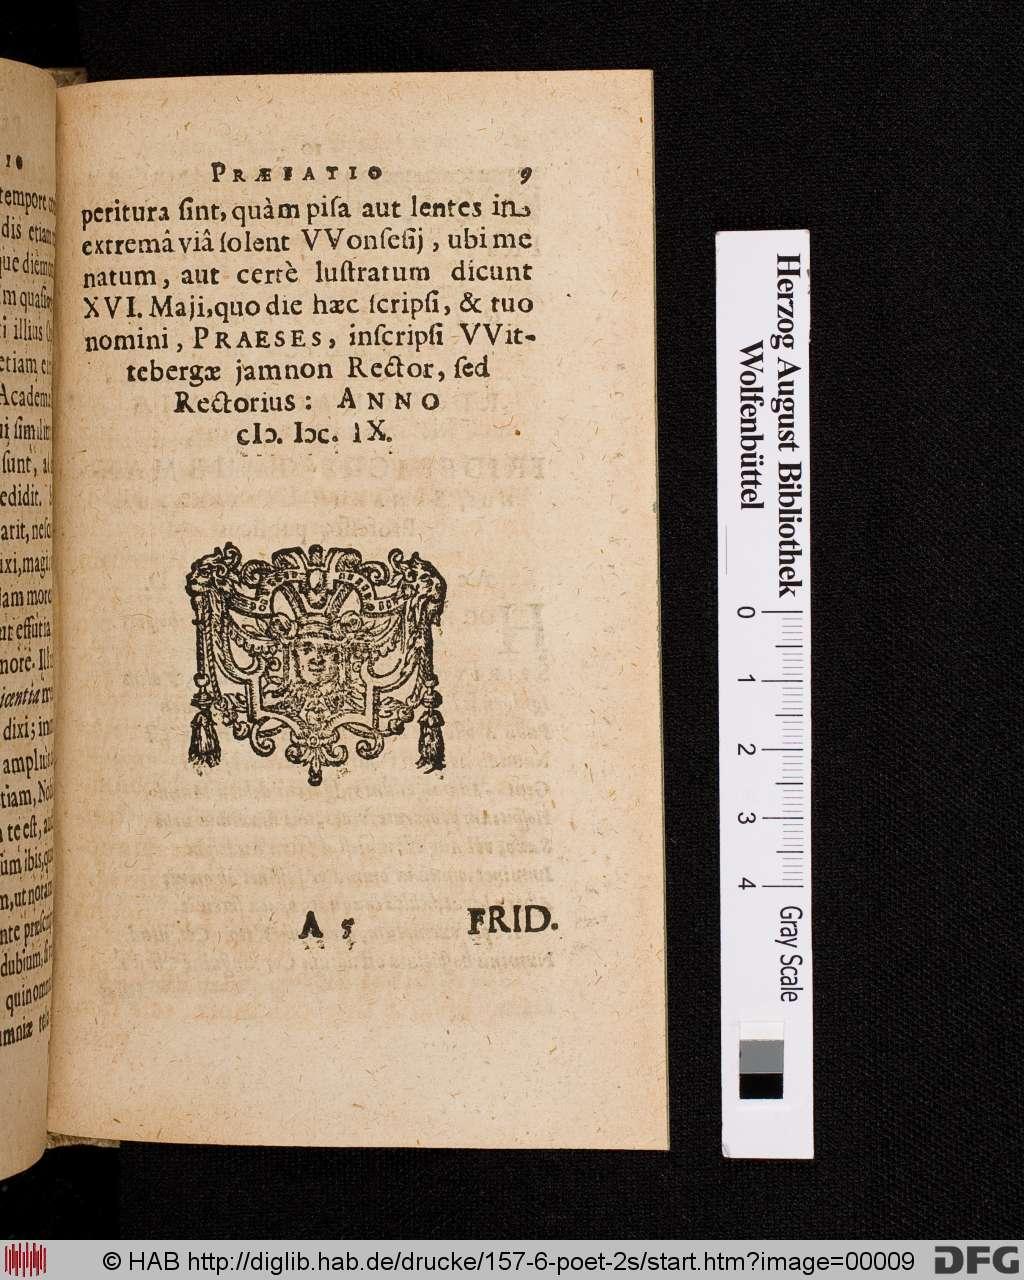 http://diglib.hab.de/drucke/157-6-poet-2s/00009.jpg